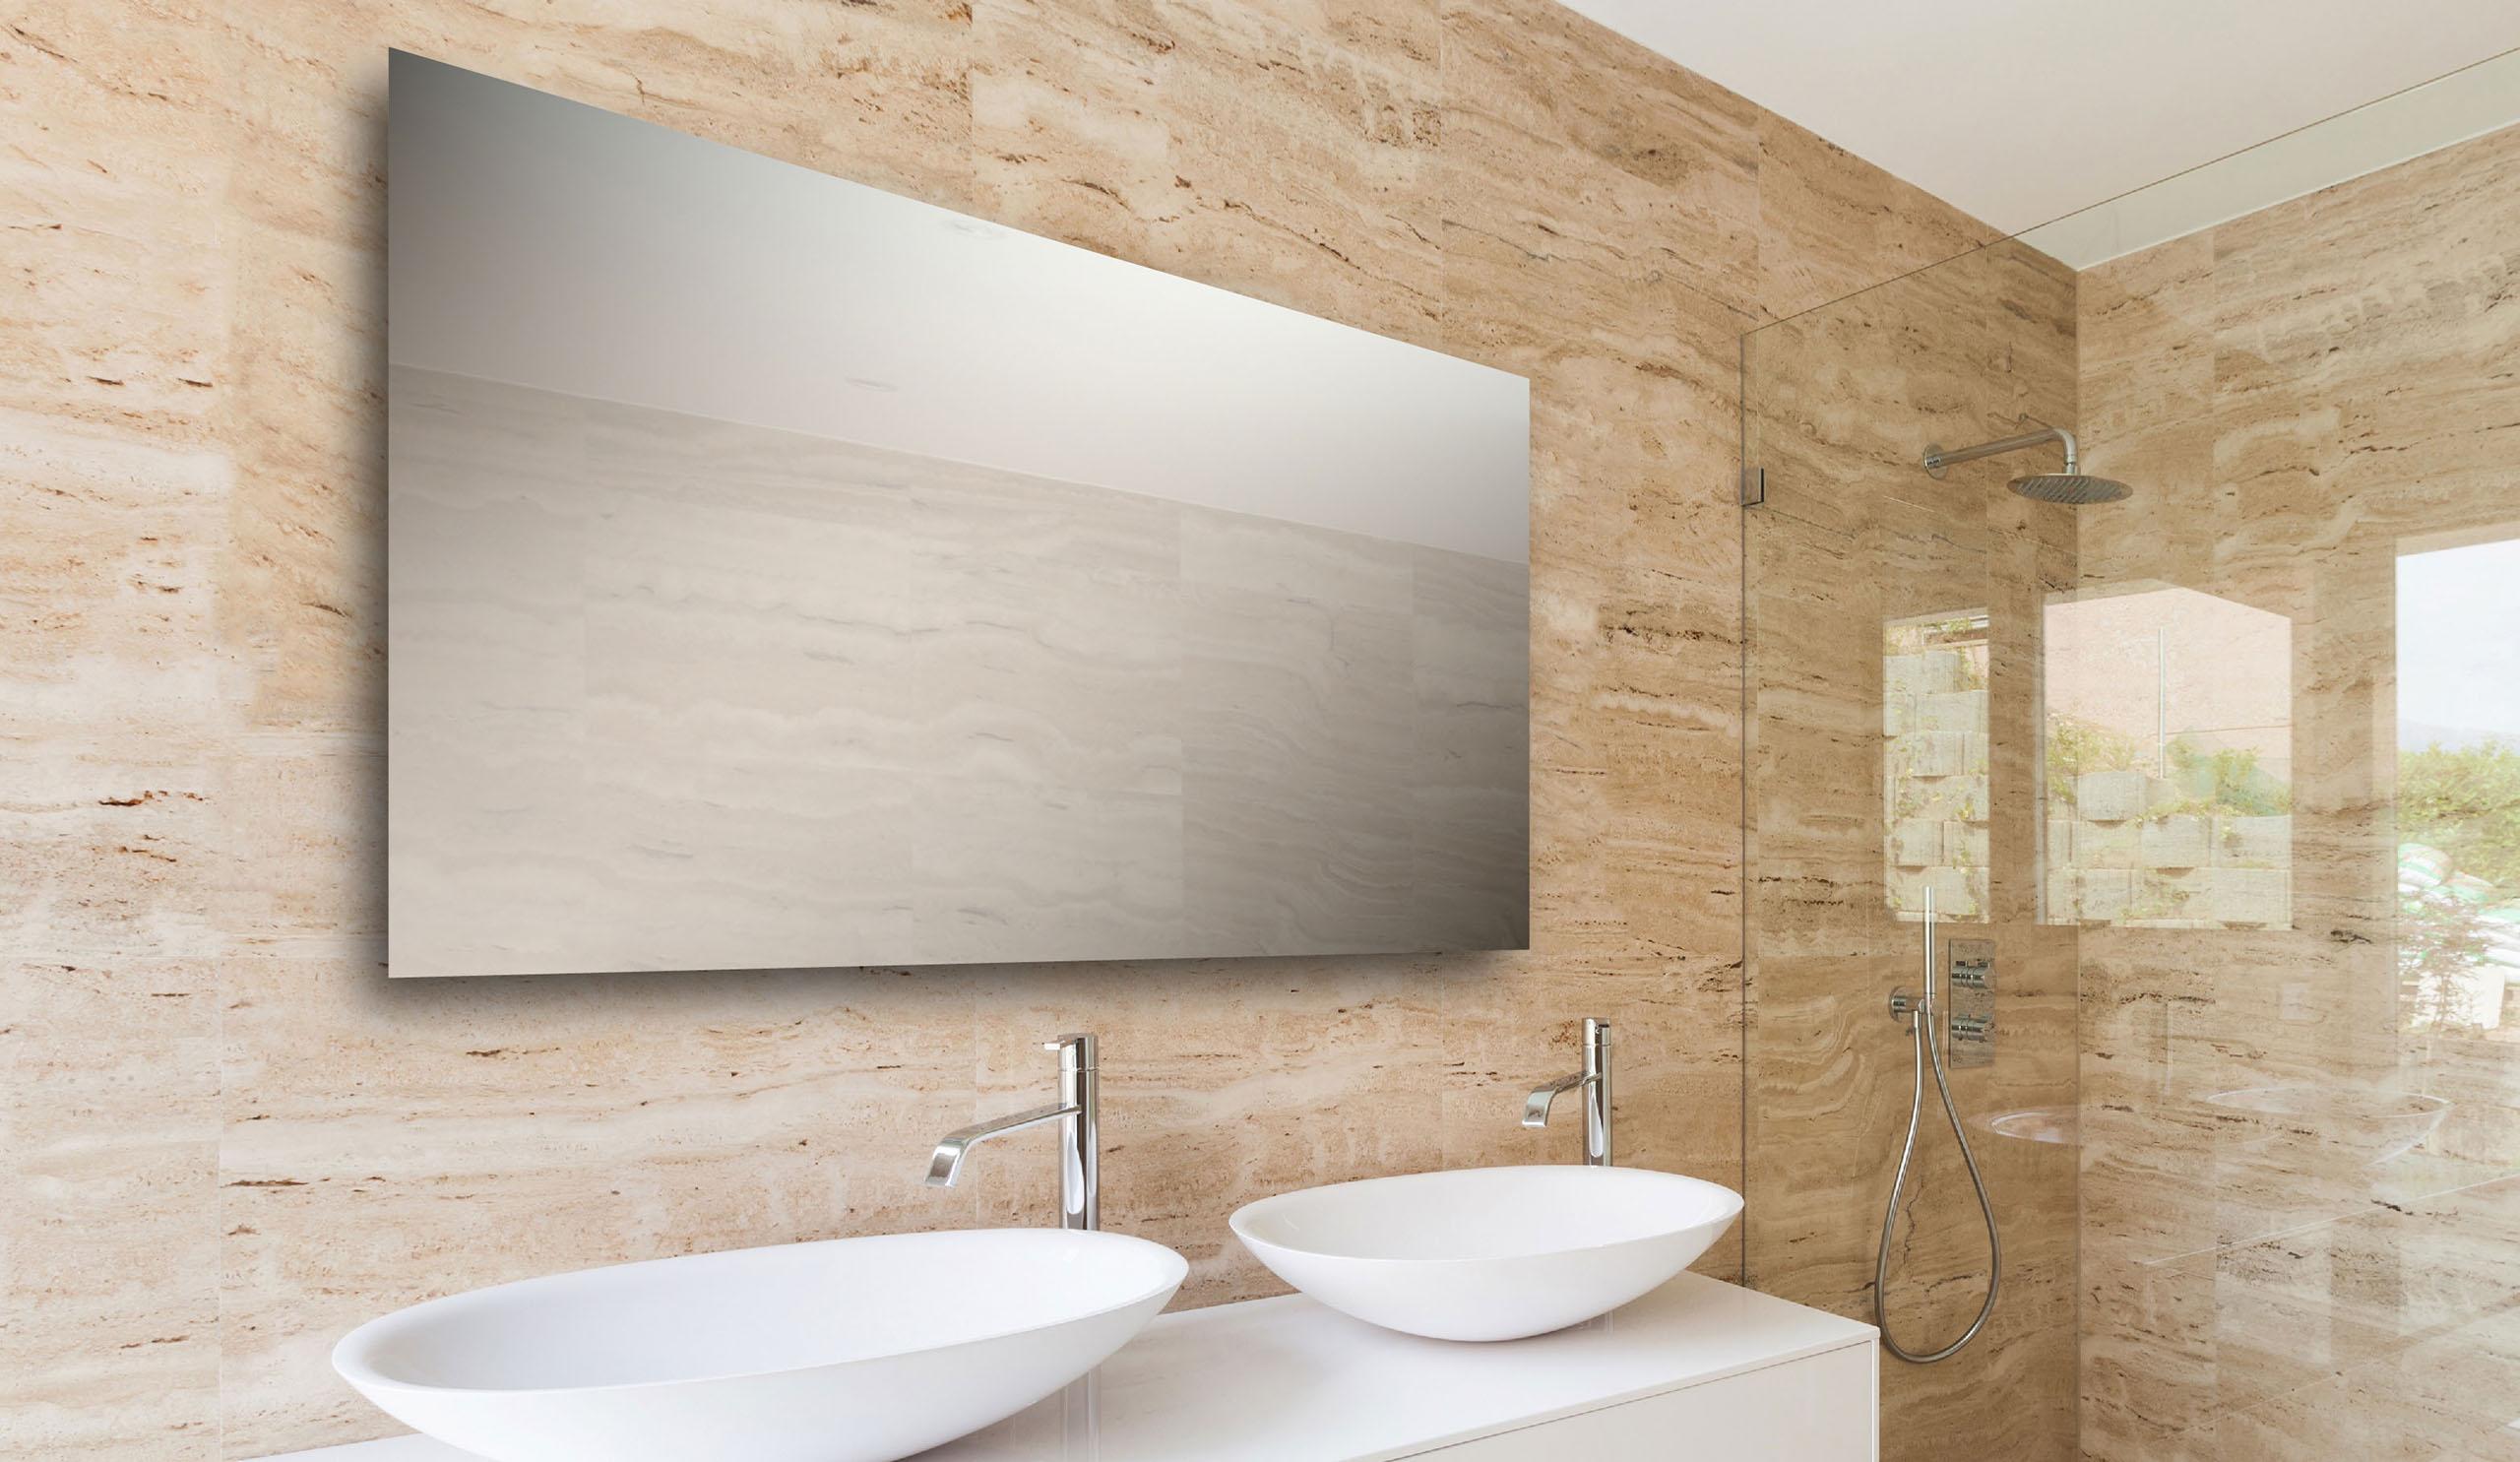 http://aqua-linea.be/images/spiegel%2060x120%20zonder%20licht%20miniatur.jpg?crc=3903437190